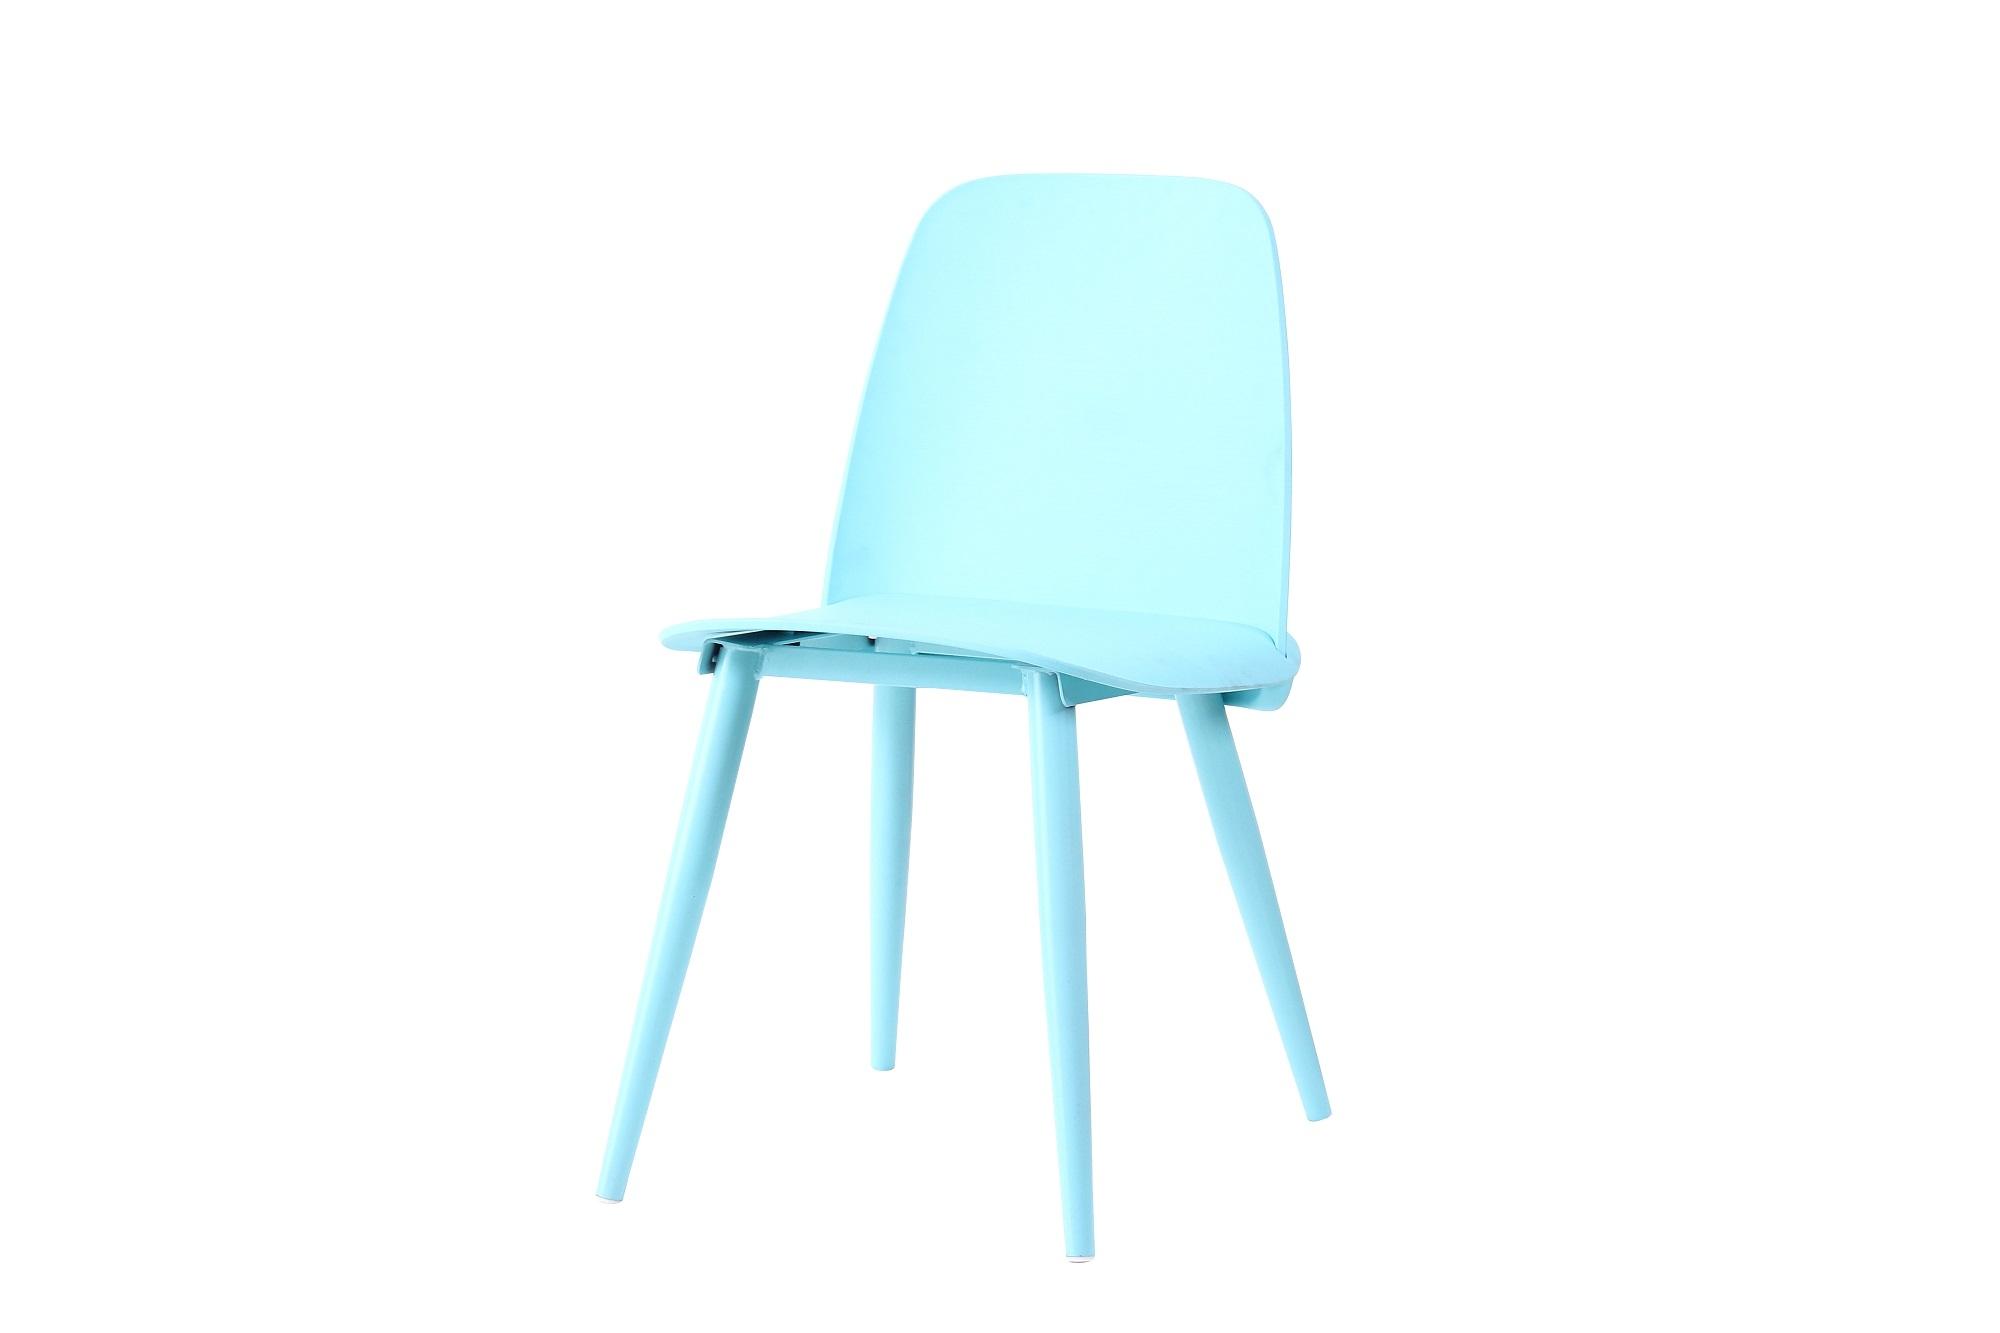 Scaun din plastic, cu picioare metalice Sting Blue, l50xA46xH80cm